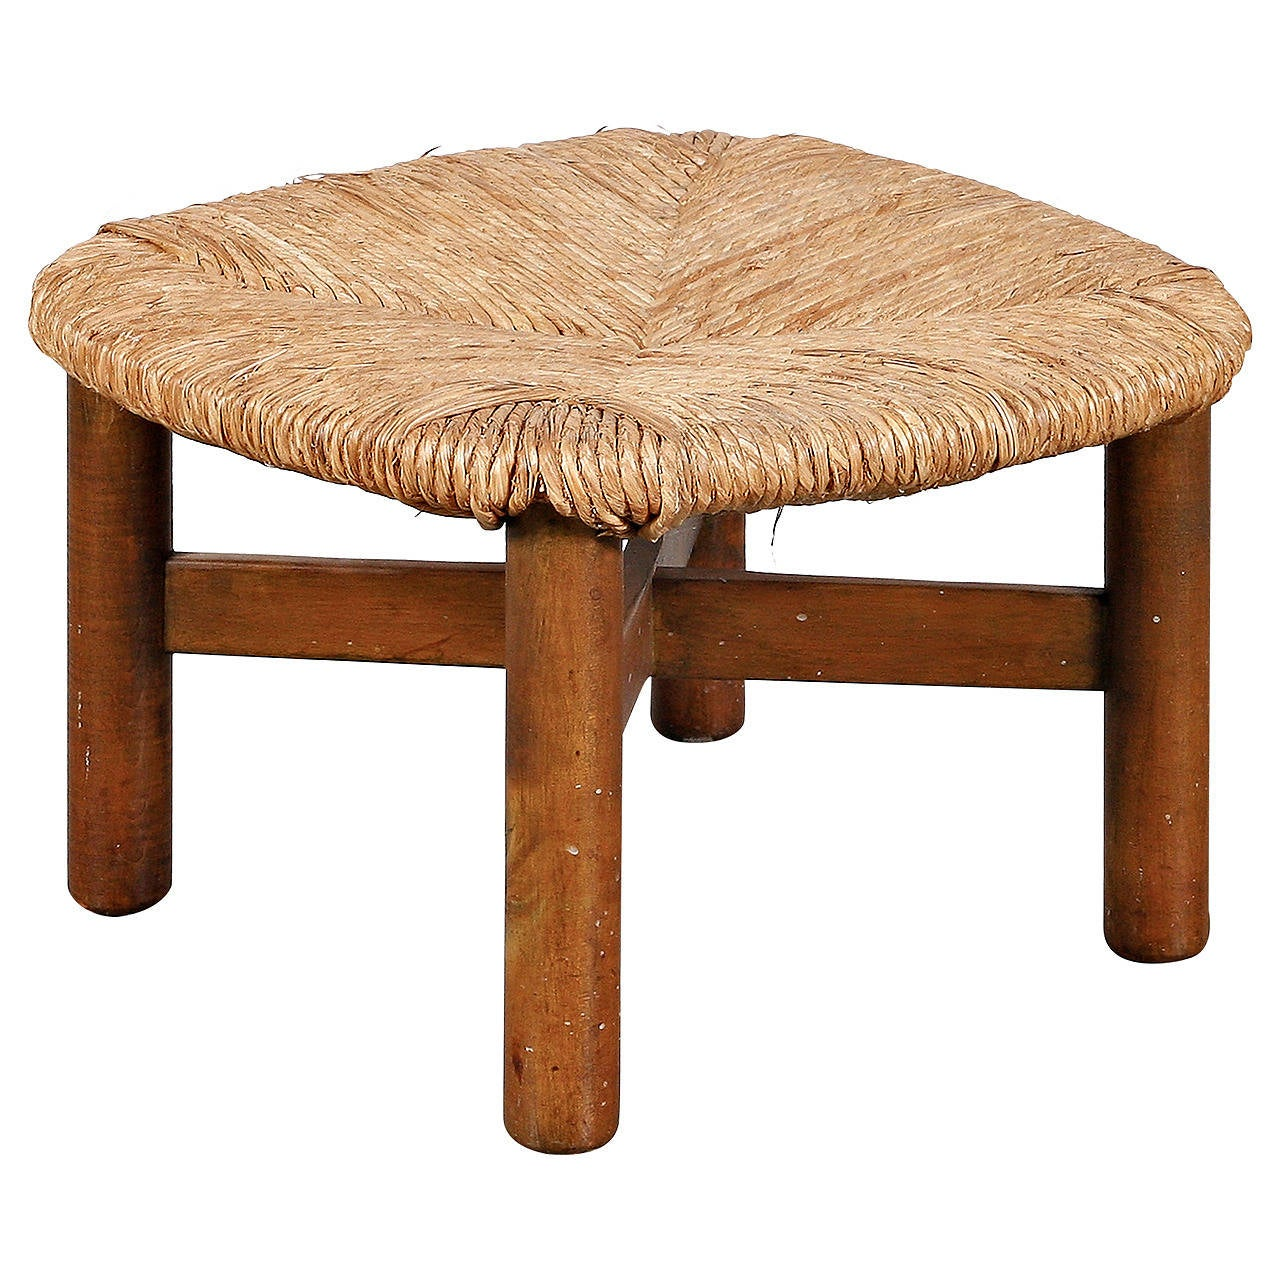 seng chicago chair camping chairs at walmart wim boon rattan stool circa 1950 1stdibs